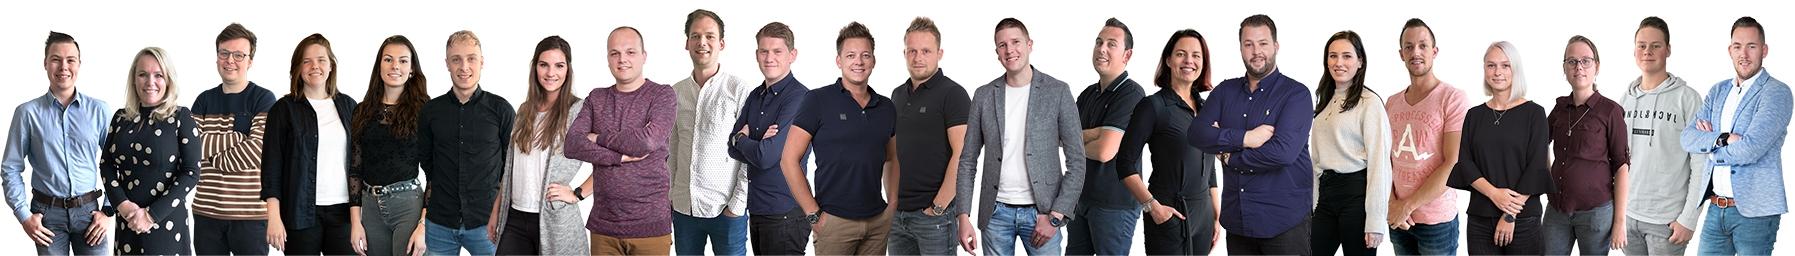 Team foto